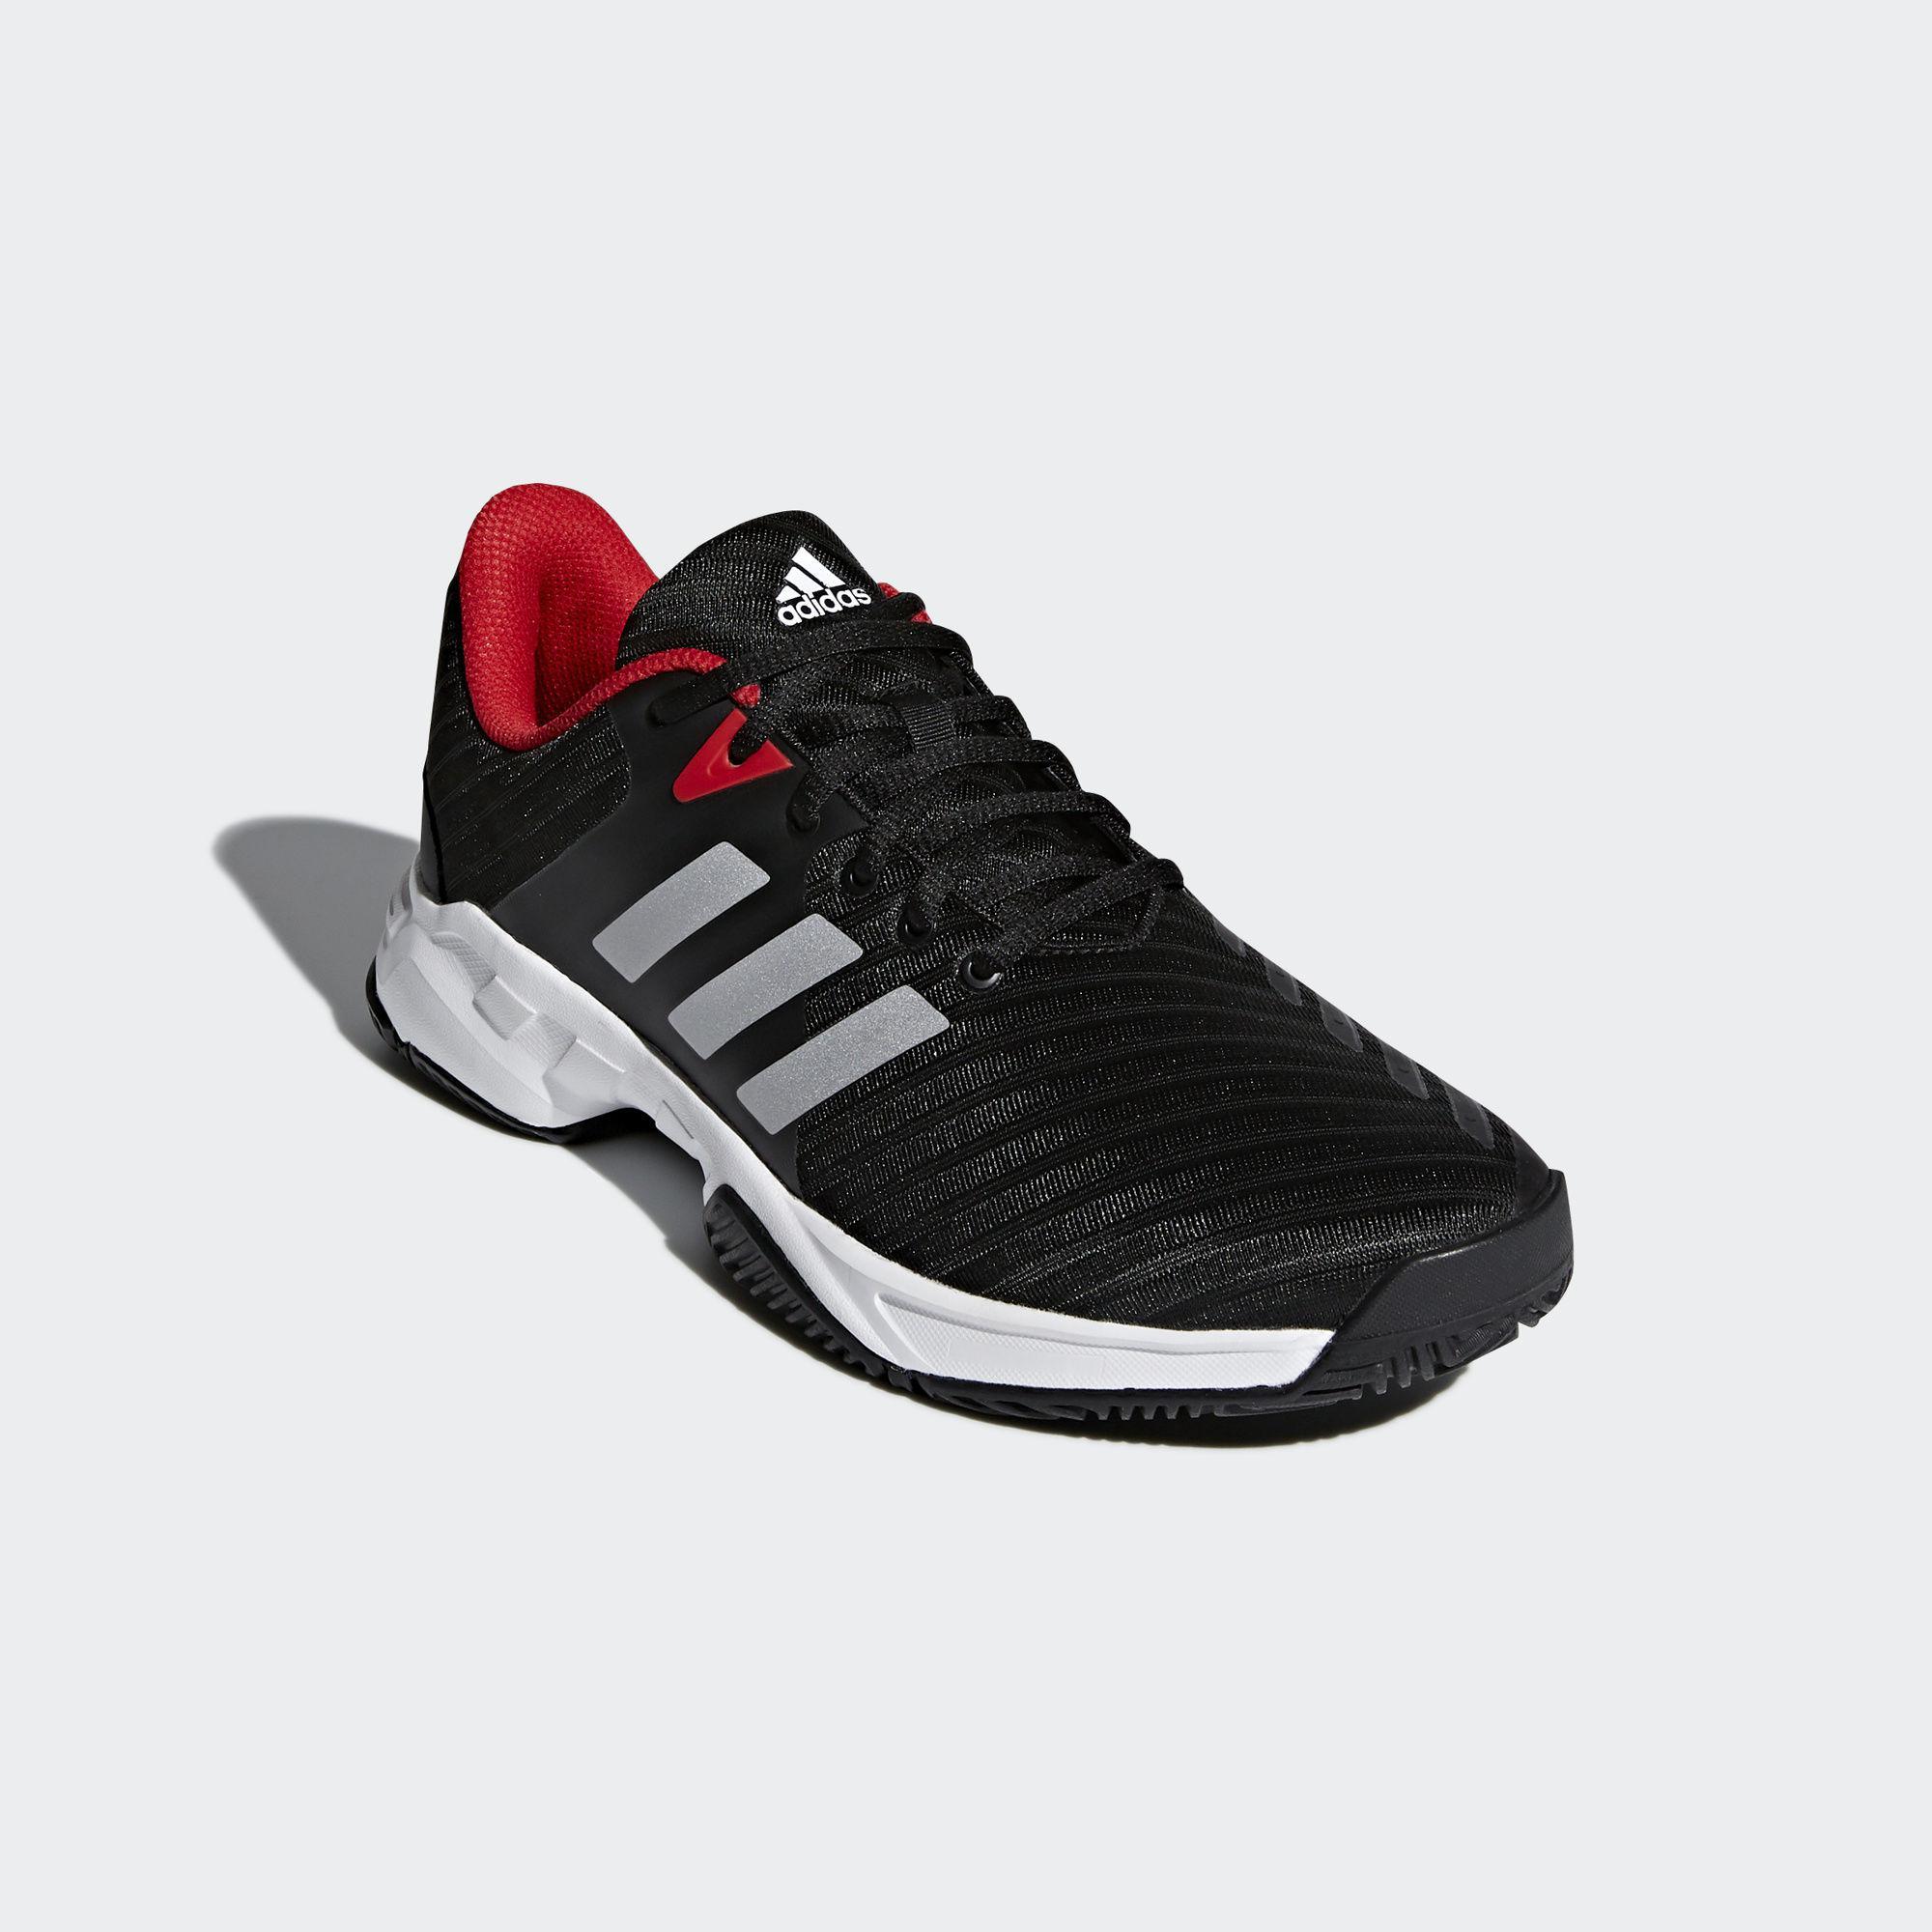 0ca7d8c1a1f0 Adidas Mens Barricade Court 3 Tennis Shoes - Black White ...